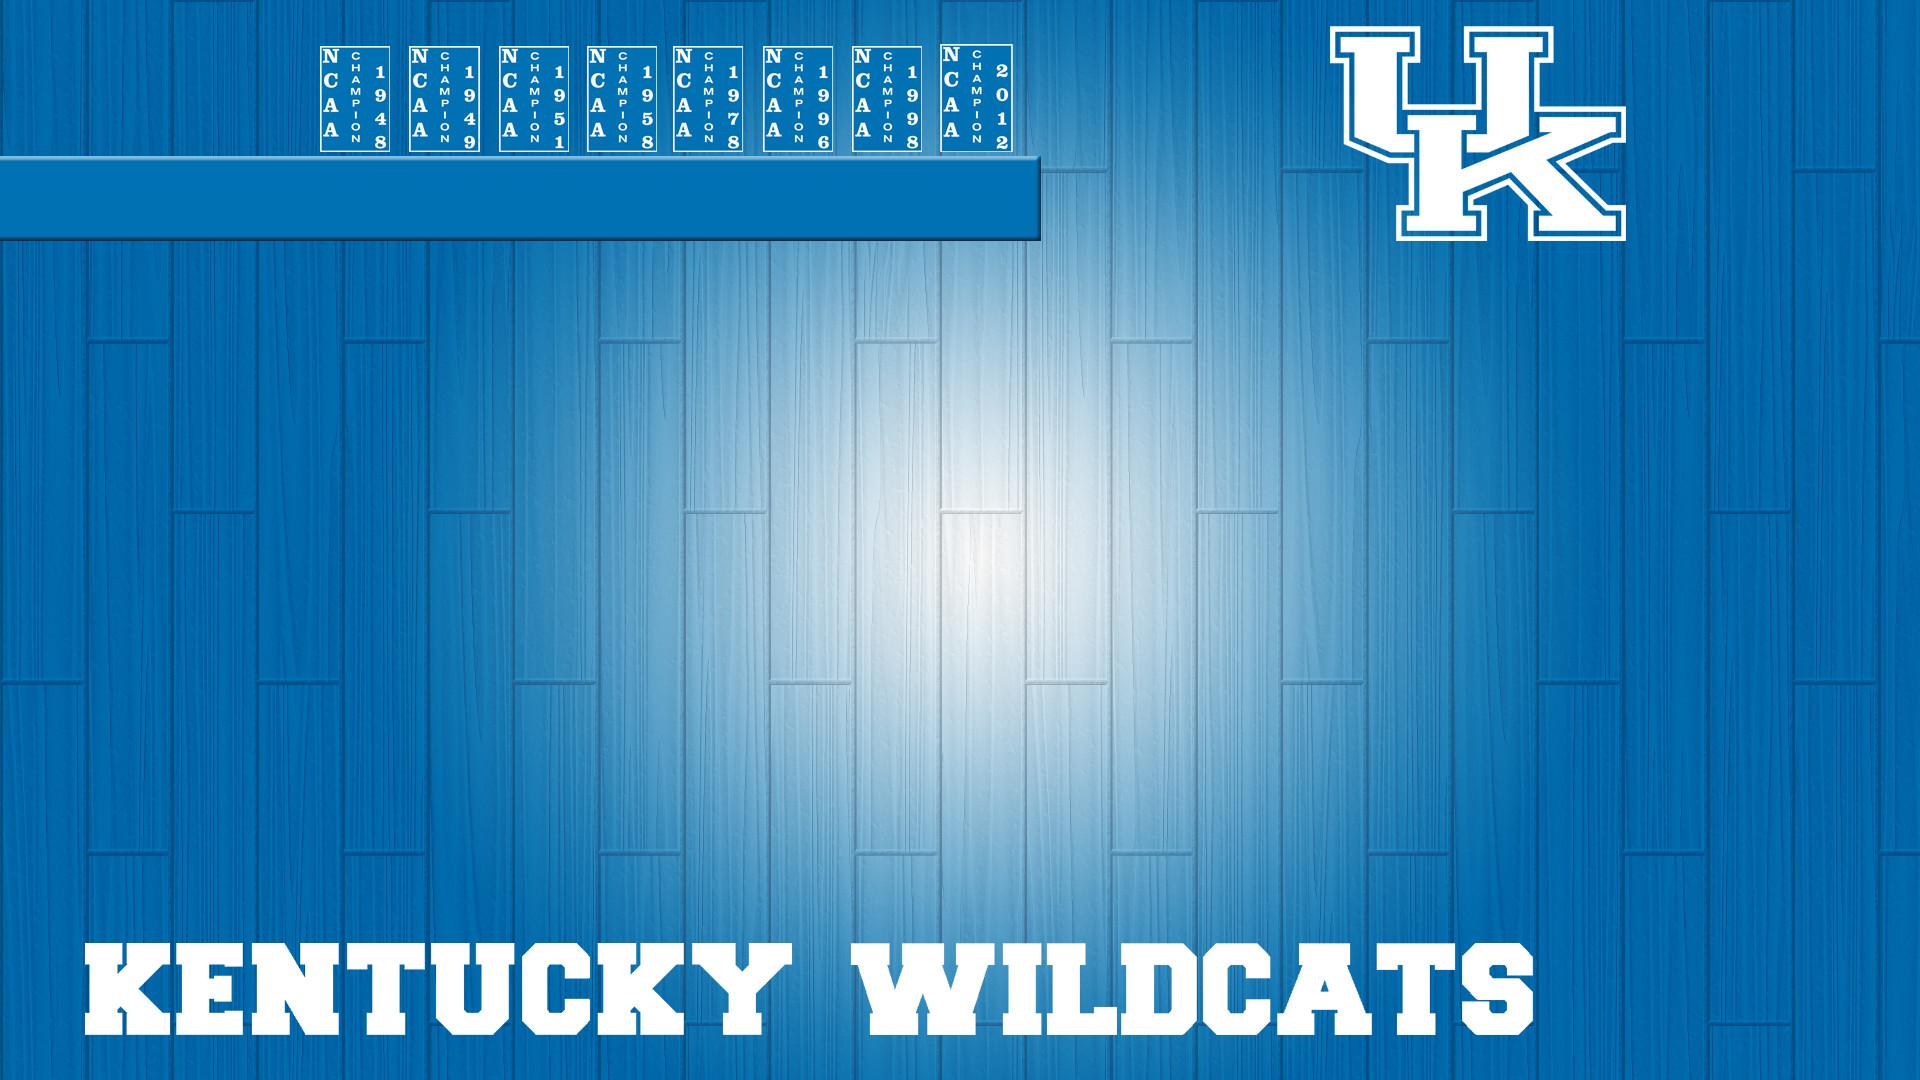 Kentucky Basketball Images Go Big Blue Hd Wallpaper And: Kentucky Wildcats Wallpapers (73+ Images